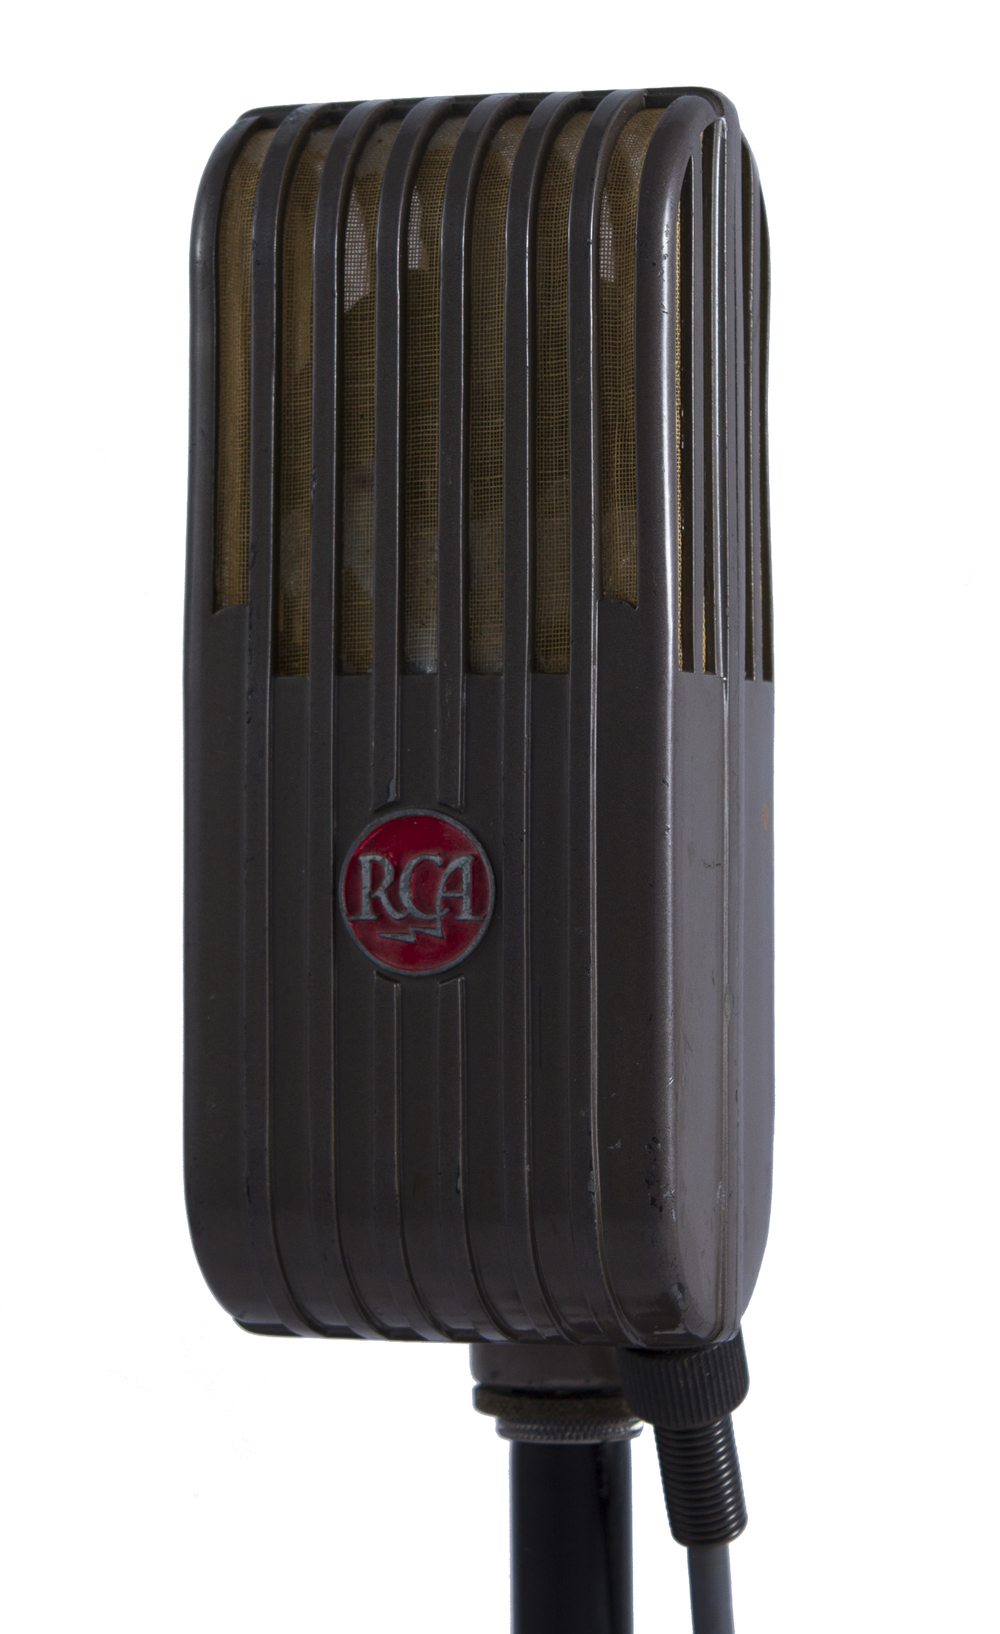 RCA SK50 Varacoustic.jpg